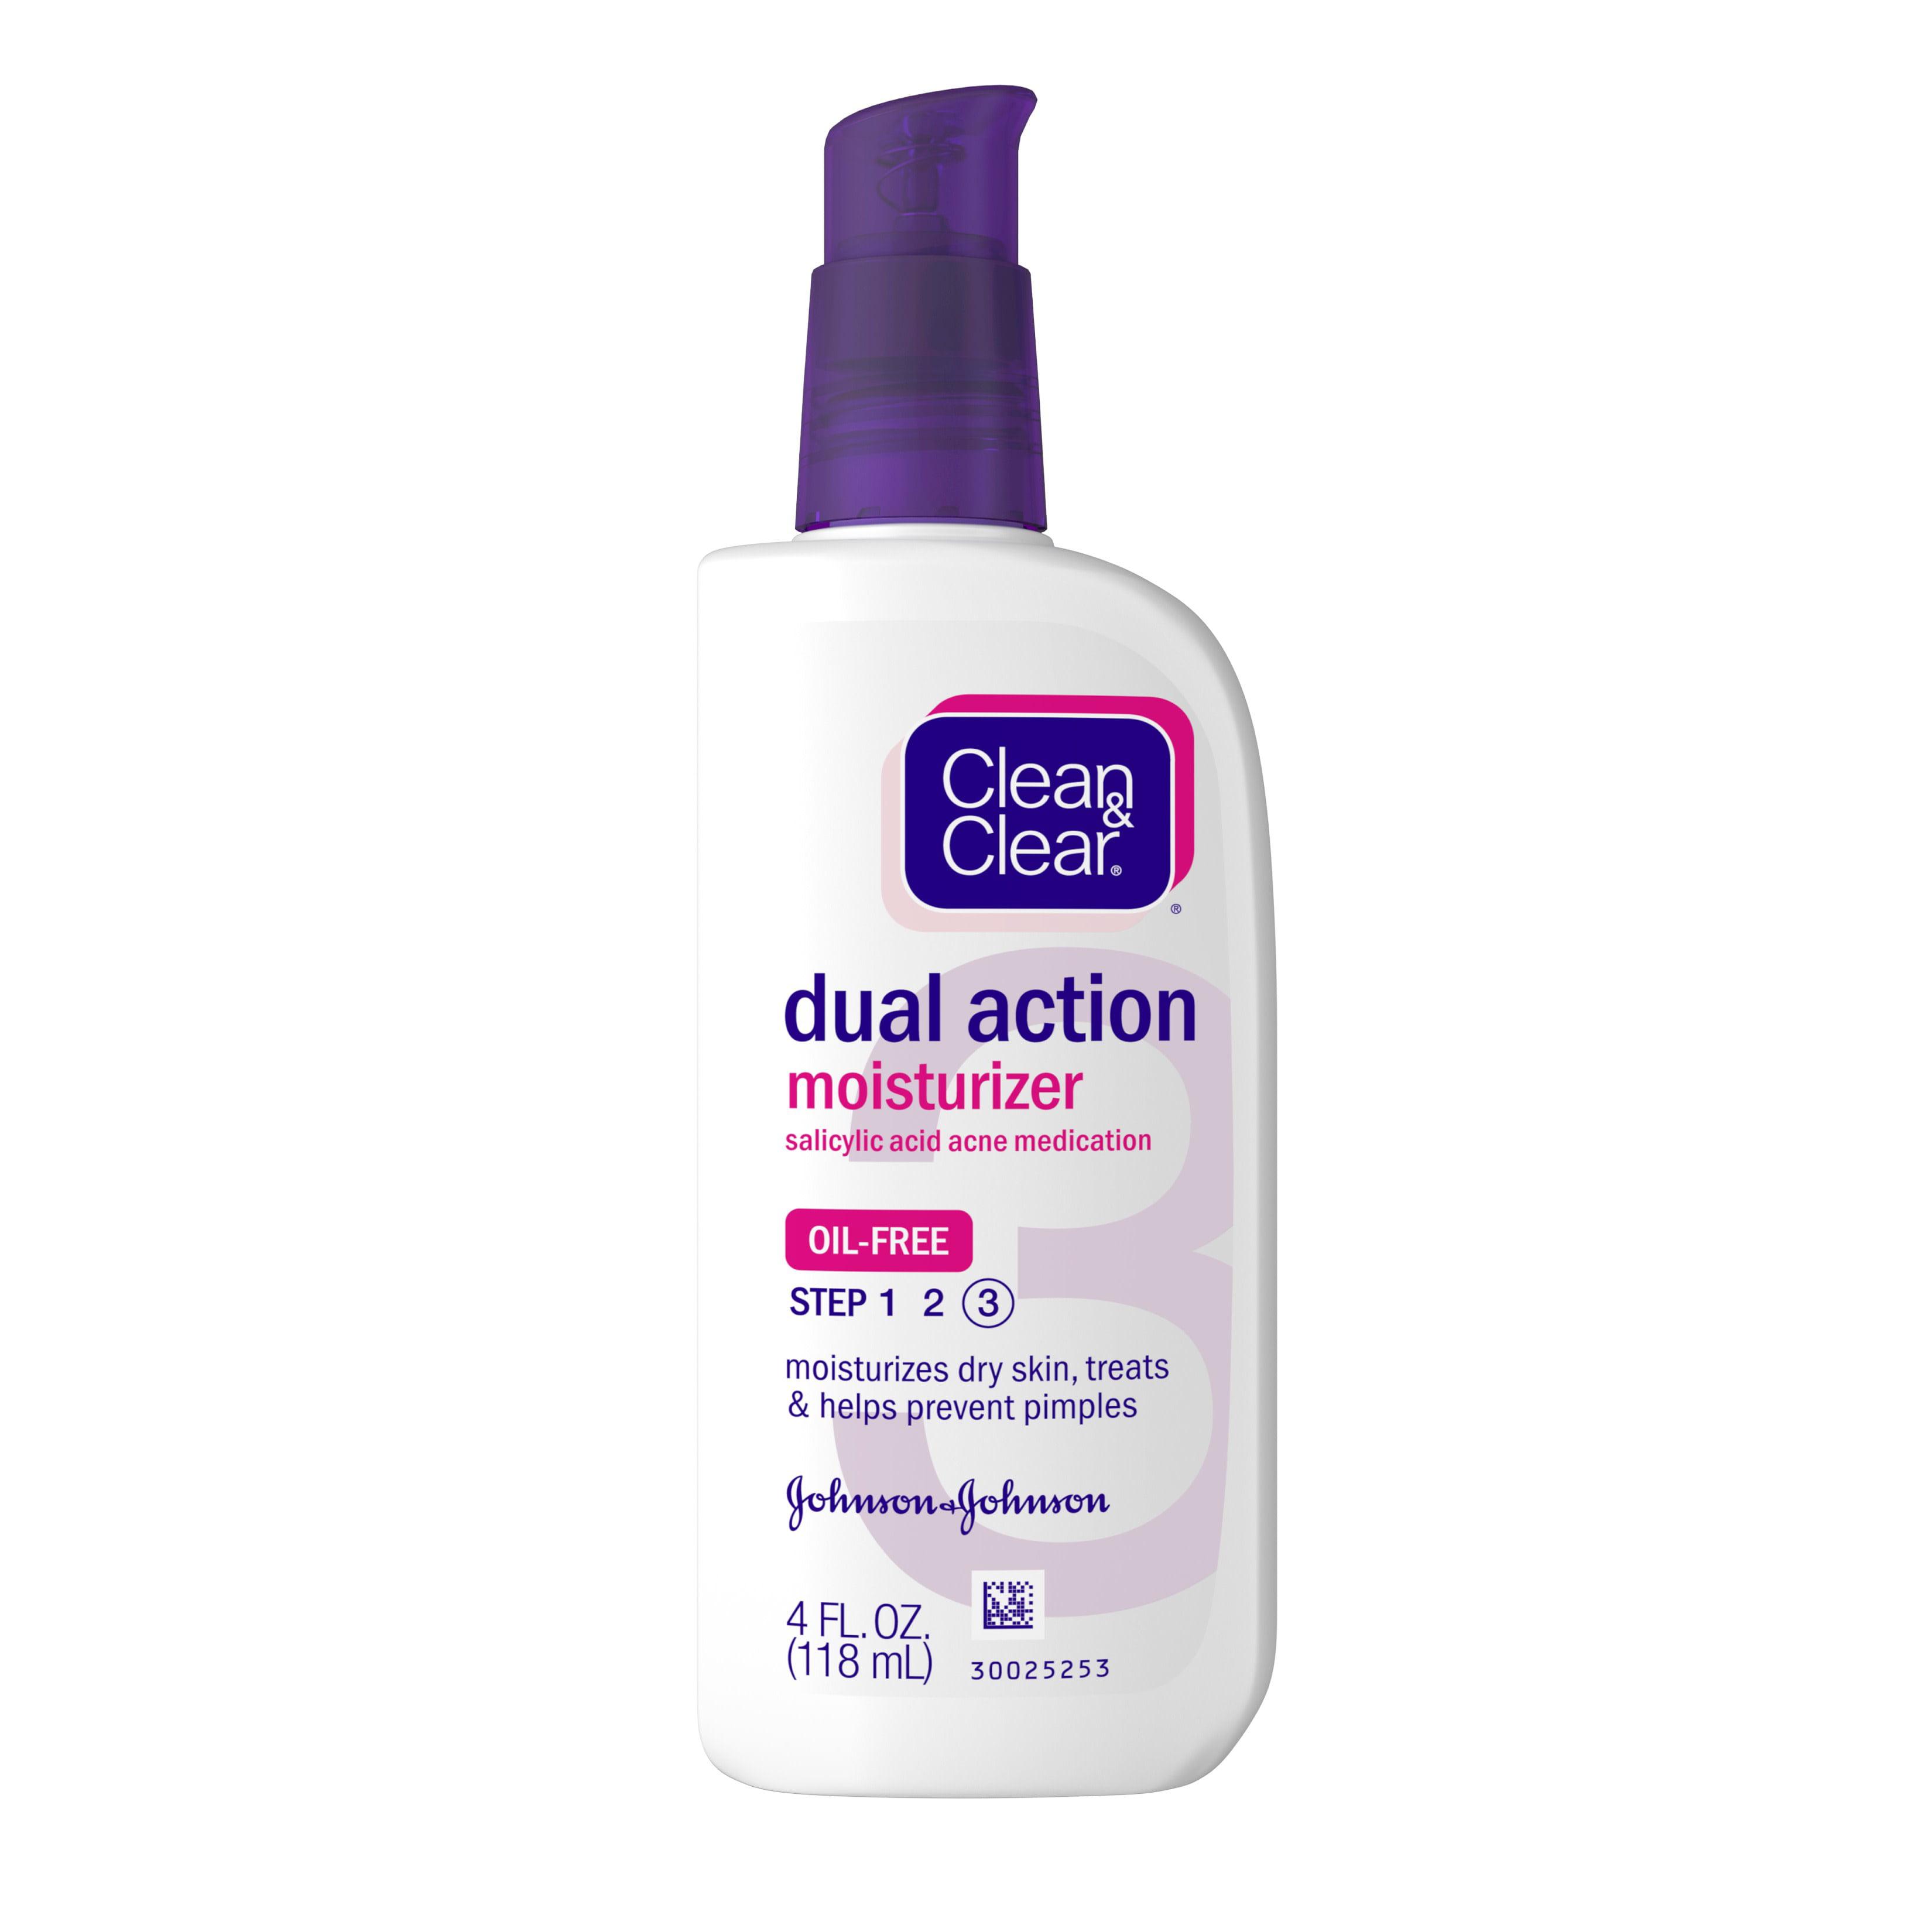 Clean Clear Essentials Facial Moisturizer With Salicylic Acid Acne Medicine Acne Treatment 4 Fl Oz Walmart Com Walmart Com